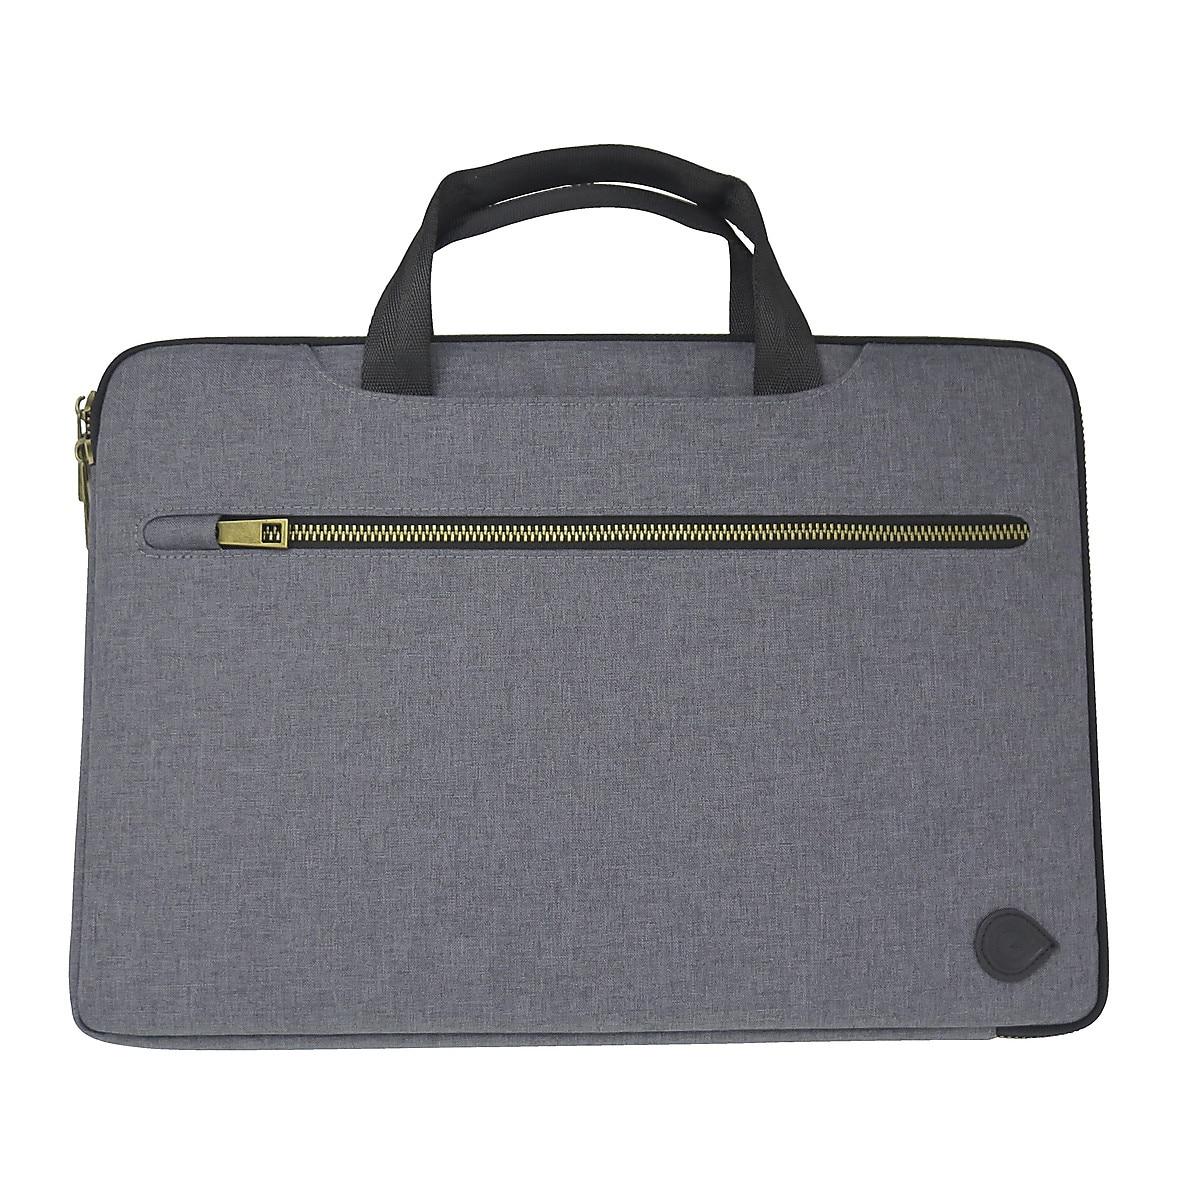 Laptopfodral 141 Exibel